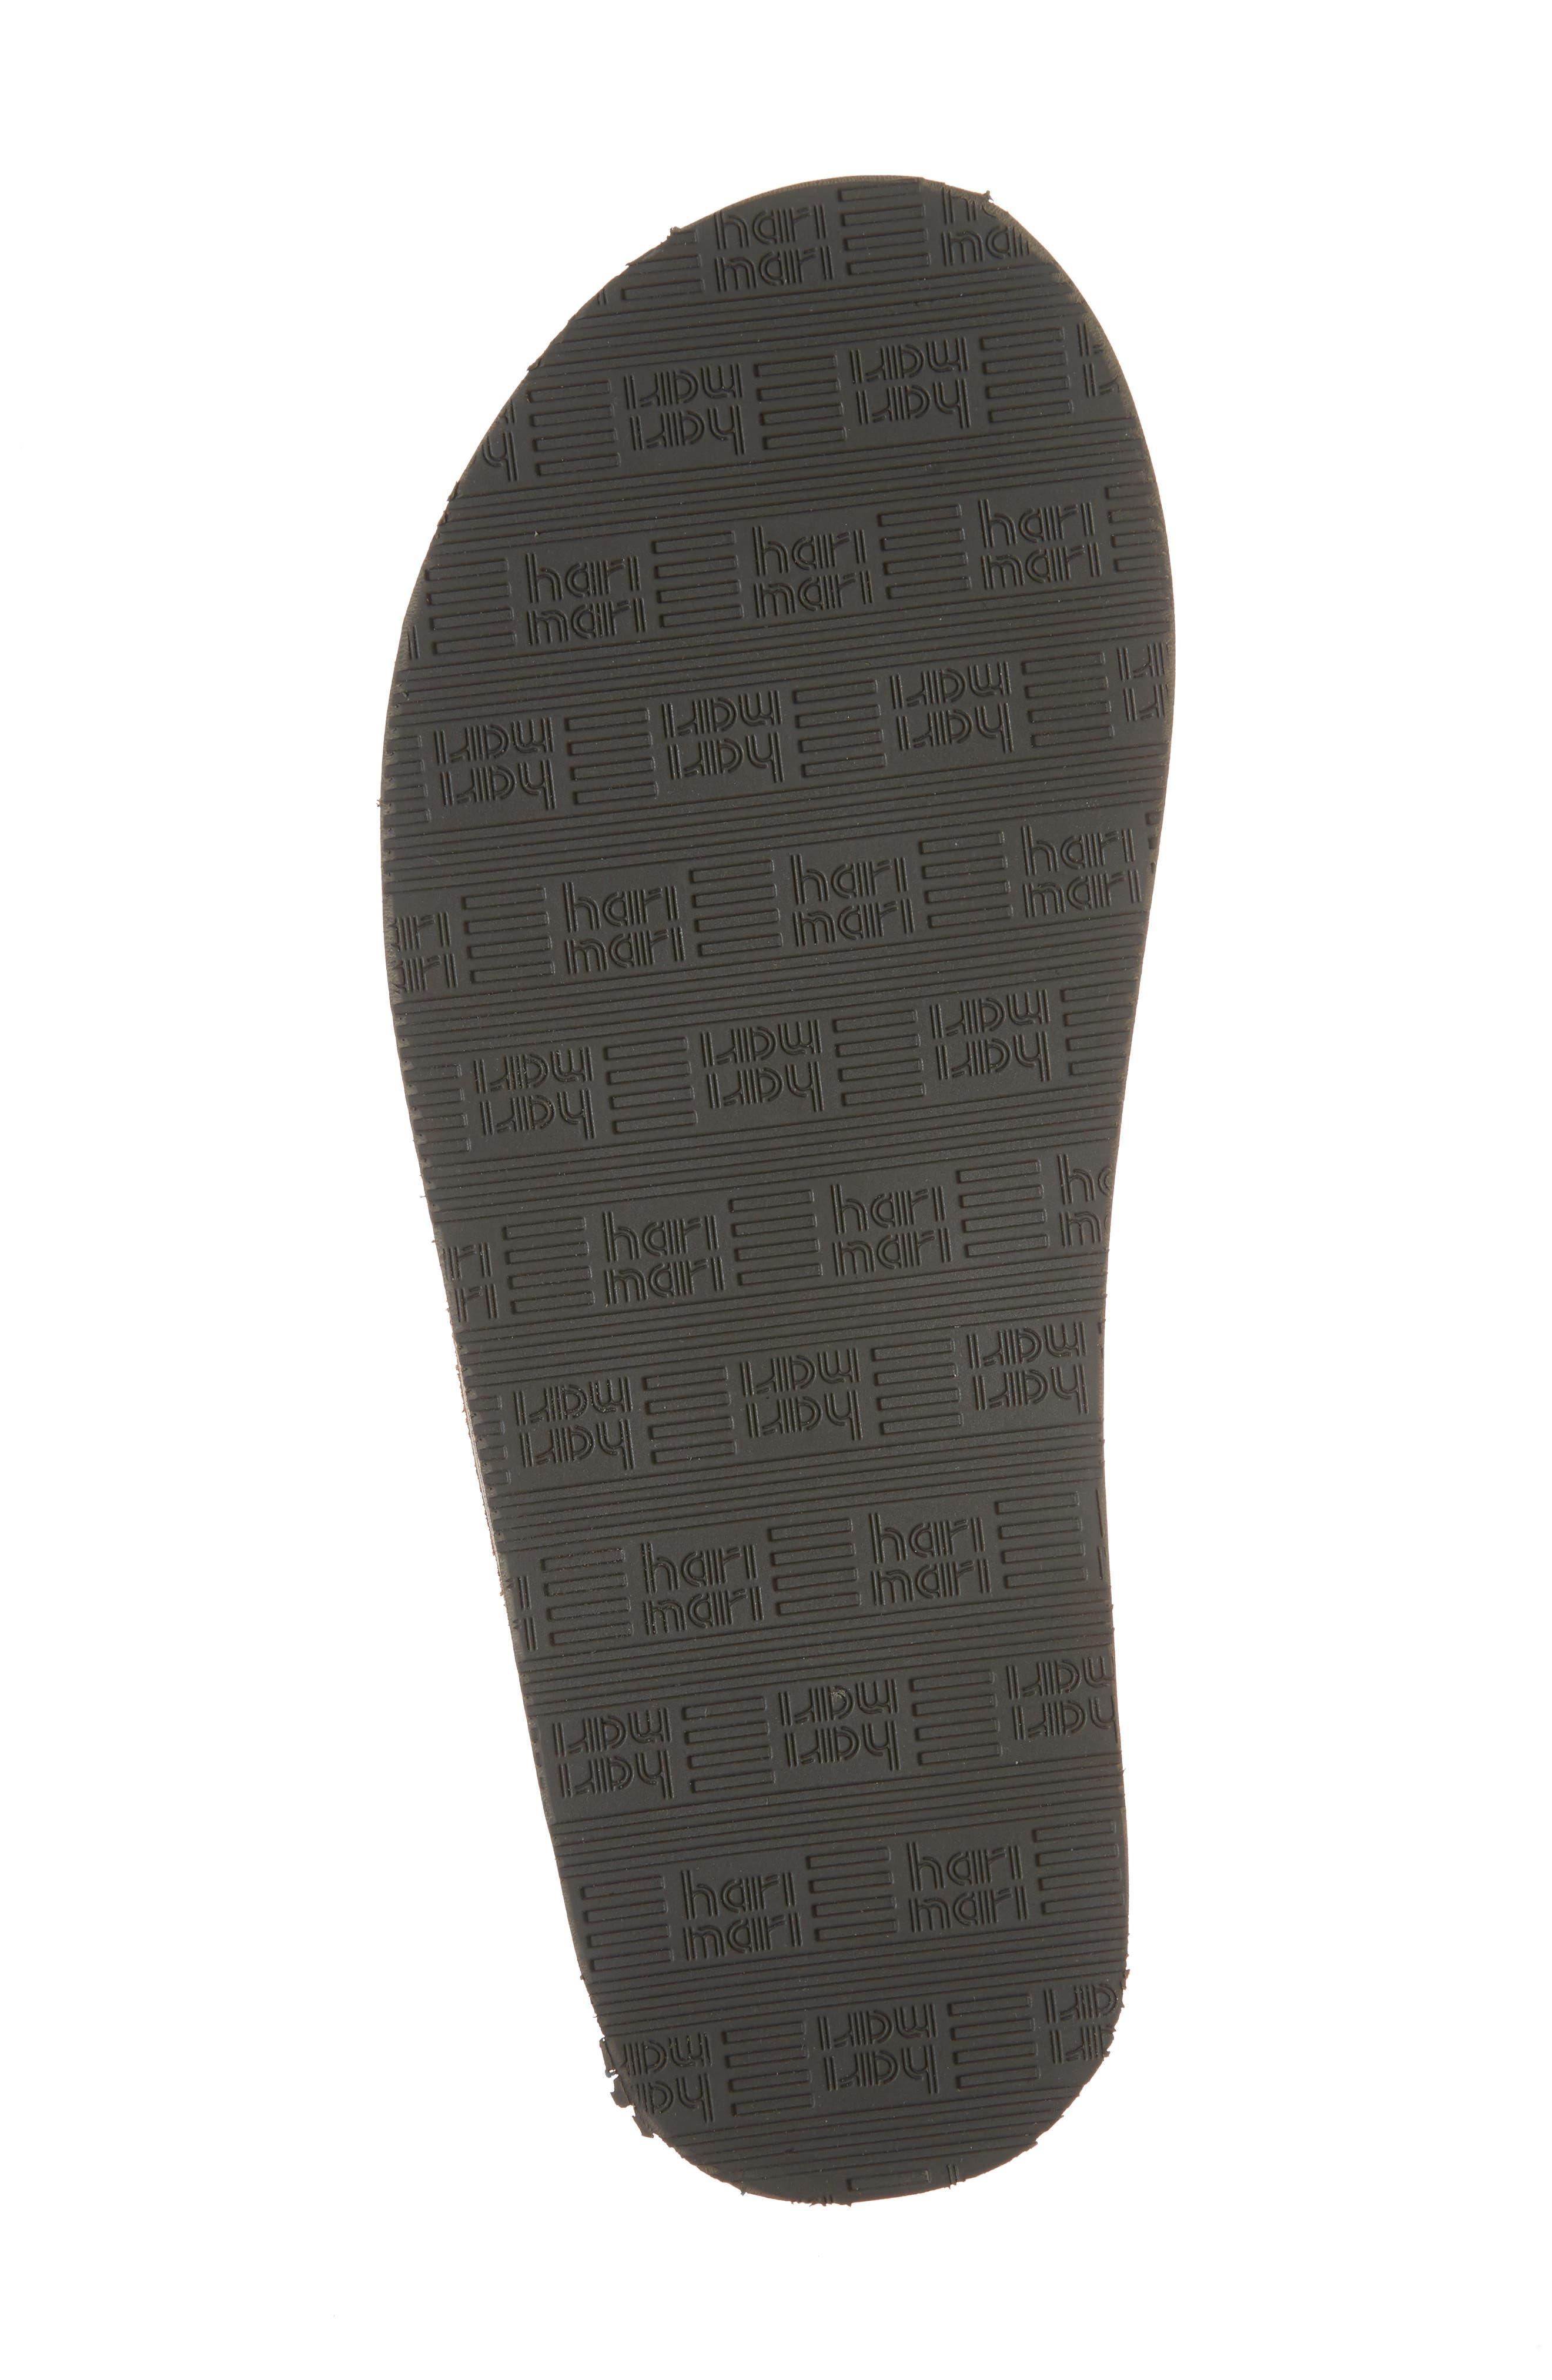 Lakes Sandwich Stripe Flip Flop,                             Alternate thumbnail 6, color,                             Tan/ Navy Leather